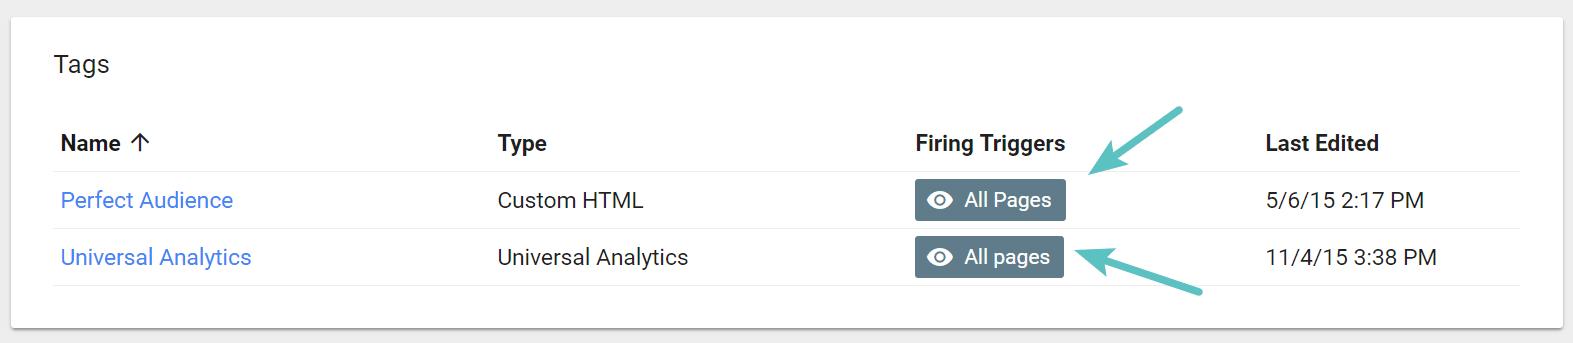 Google Tag Manager ignition trigger